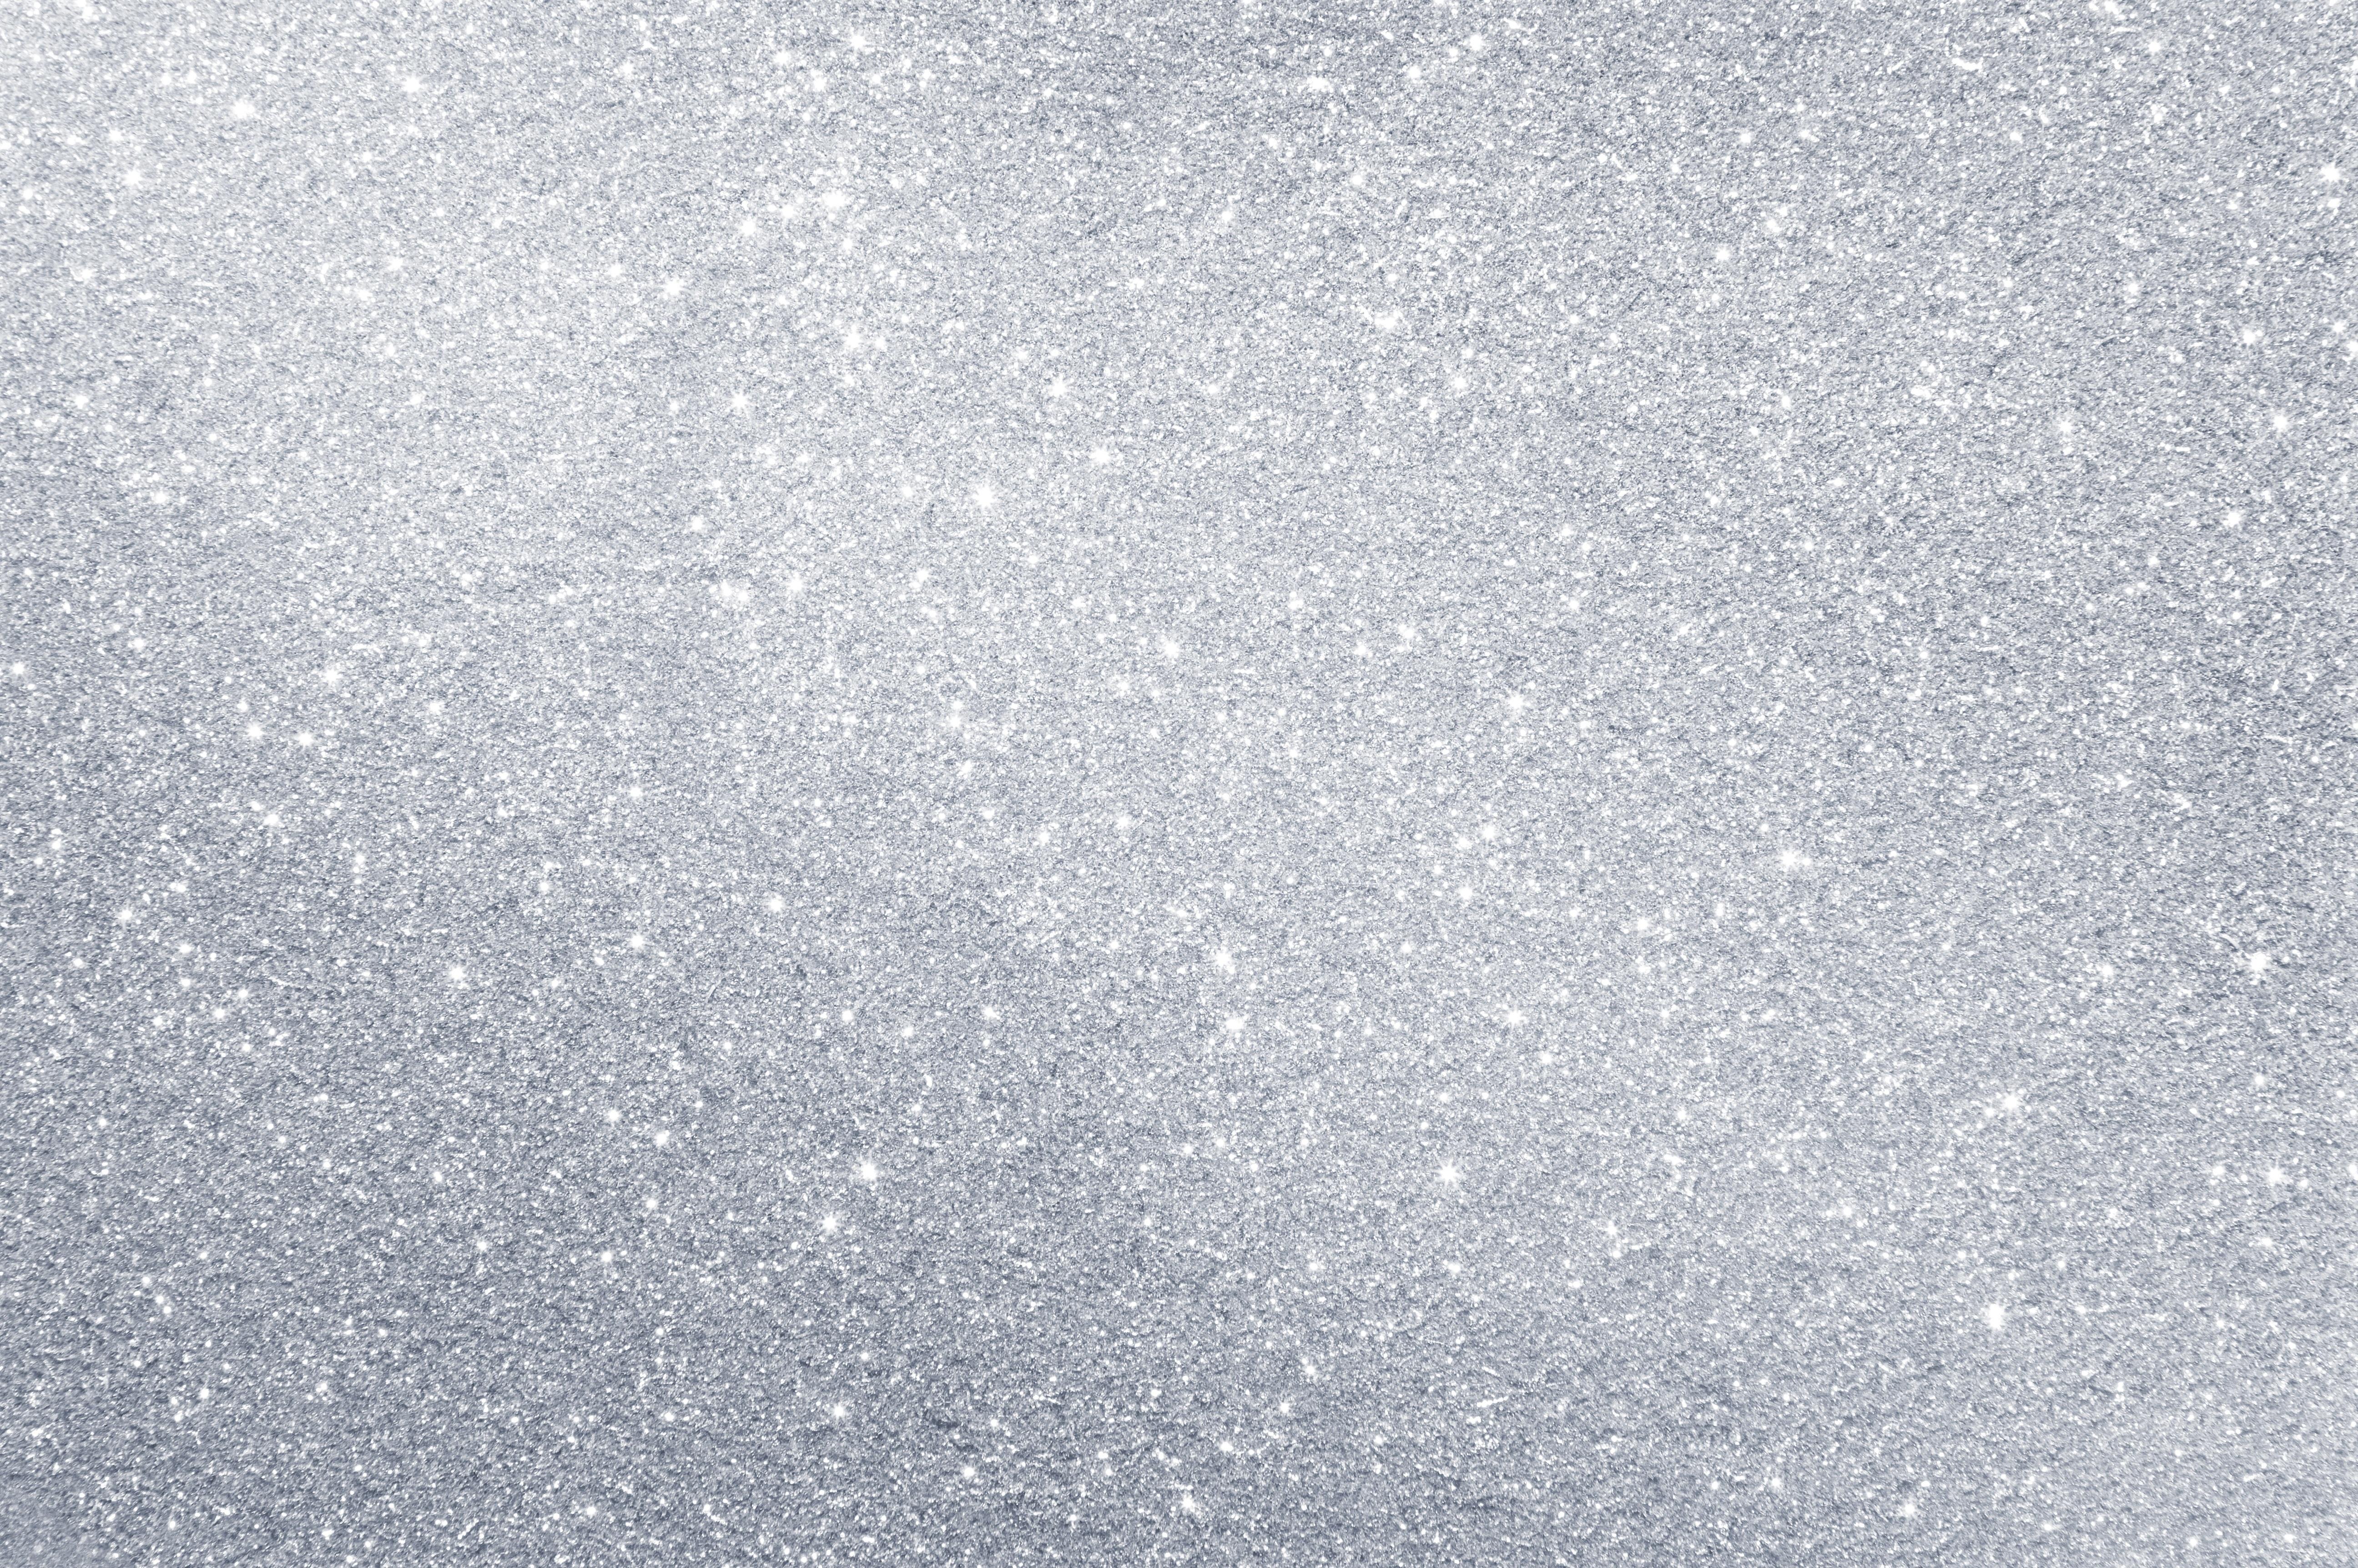 Wallpaper silver glitter texture background wallpapers textures 5184x3448